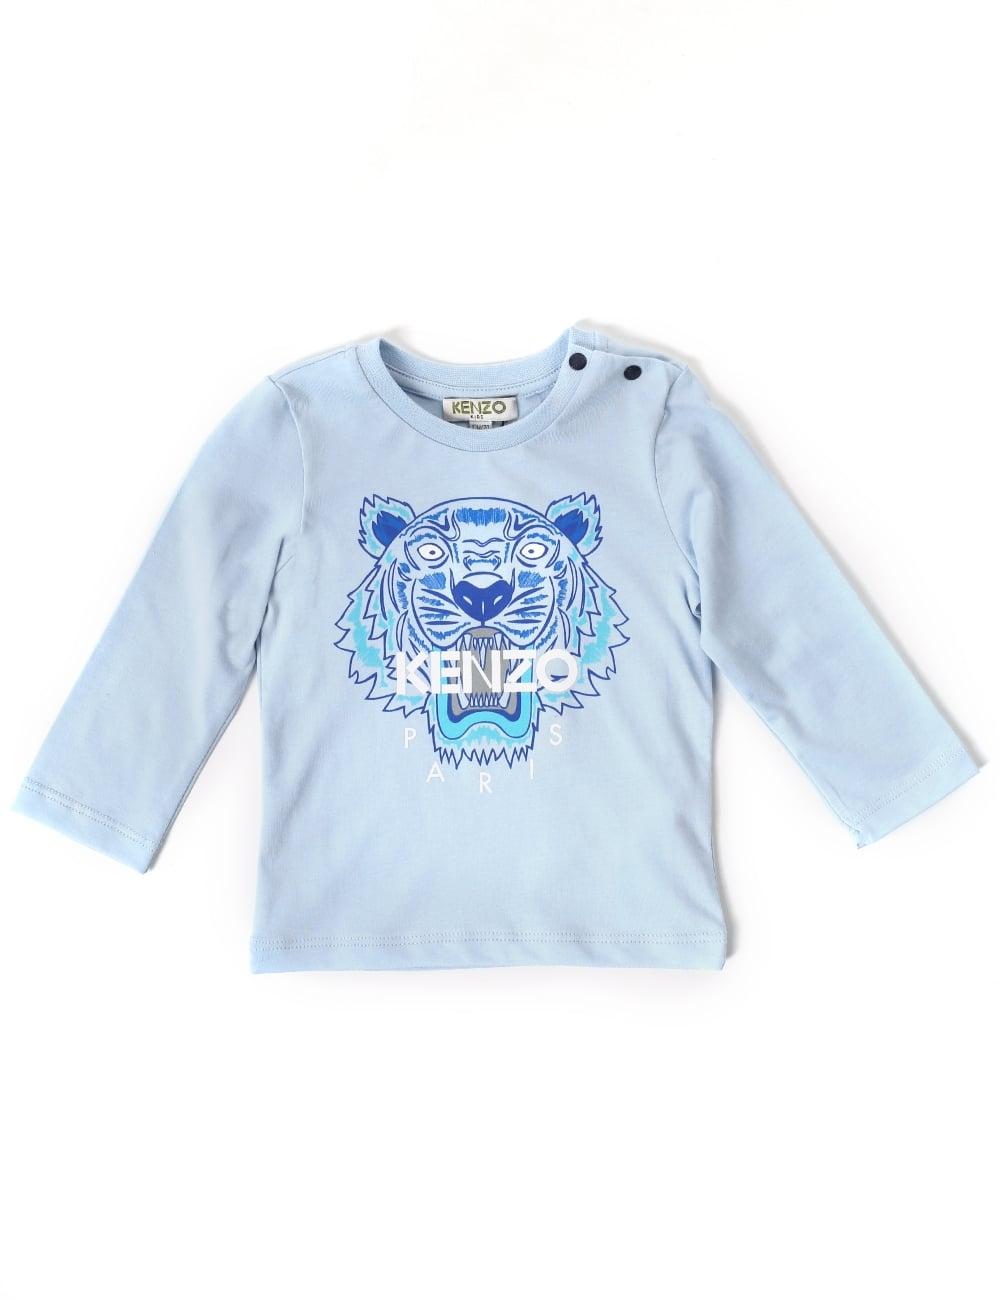 ac453e39 Kenzo Baby Boys Tiger 47 Long Sleeve Tee